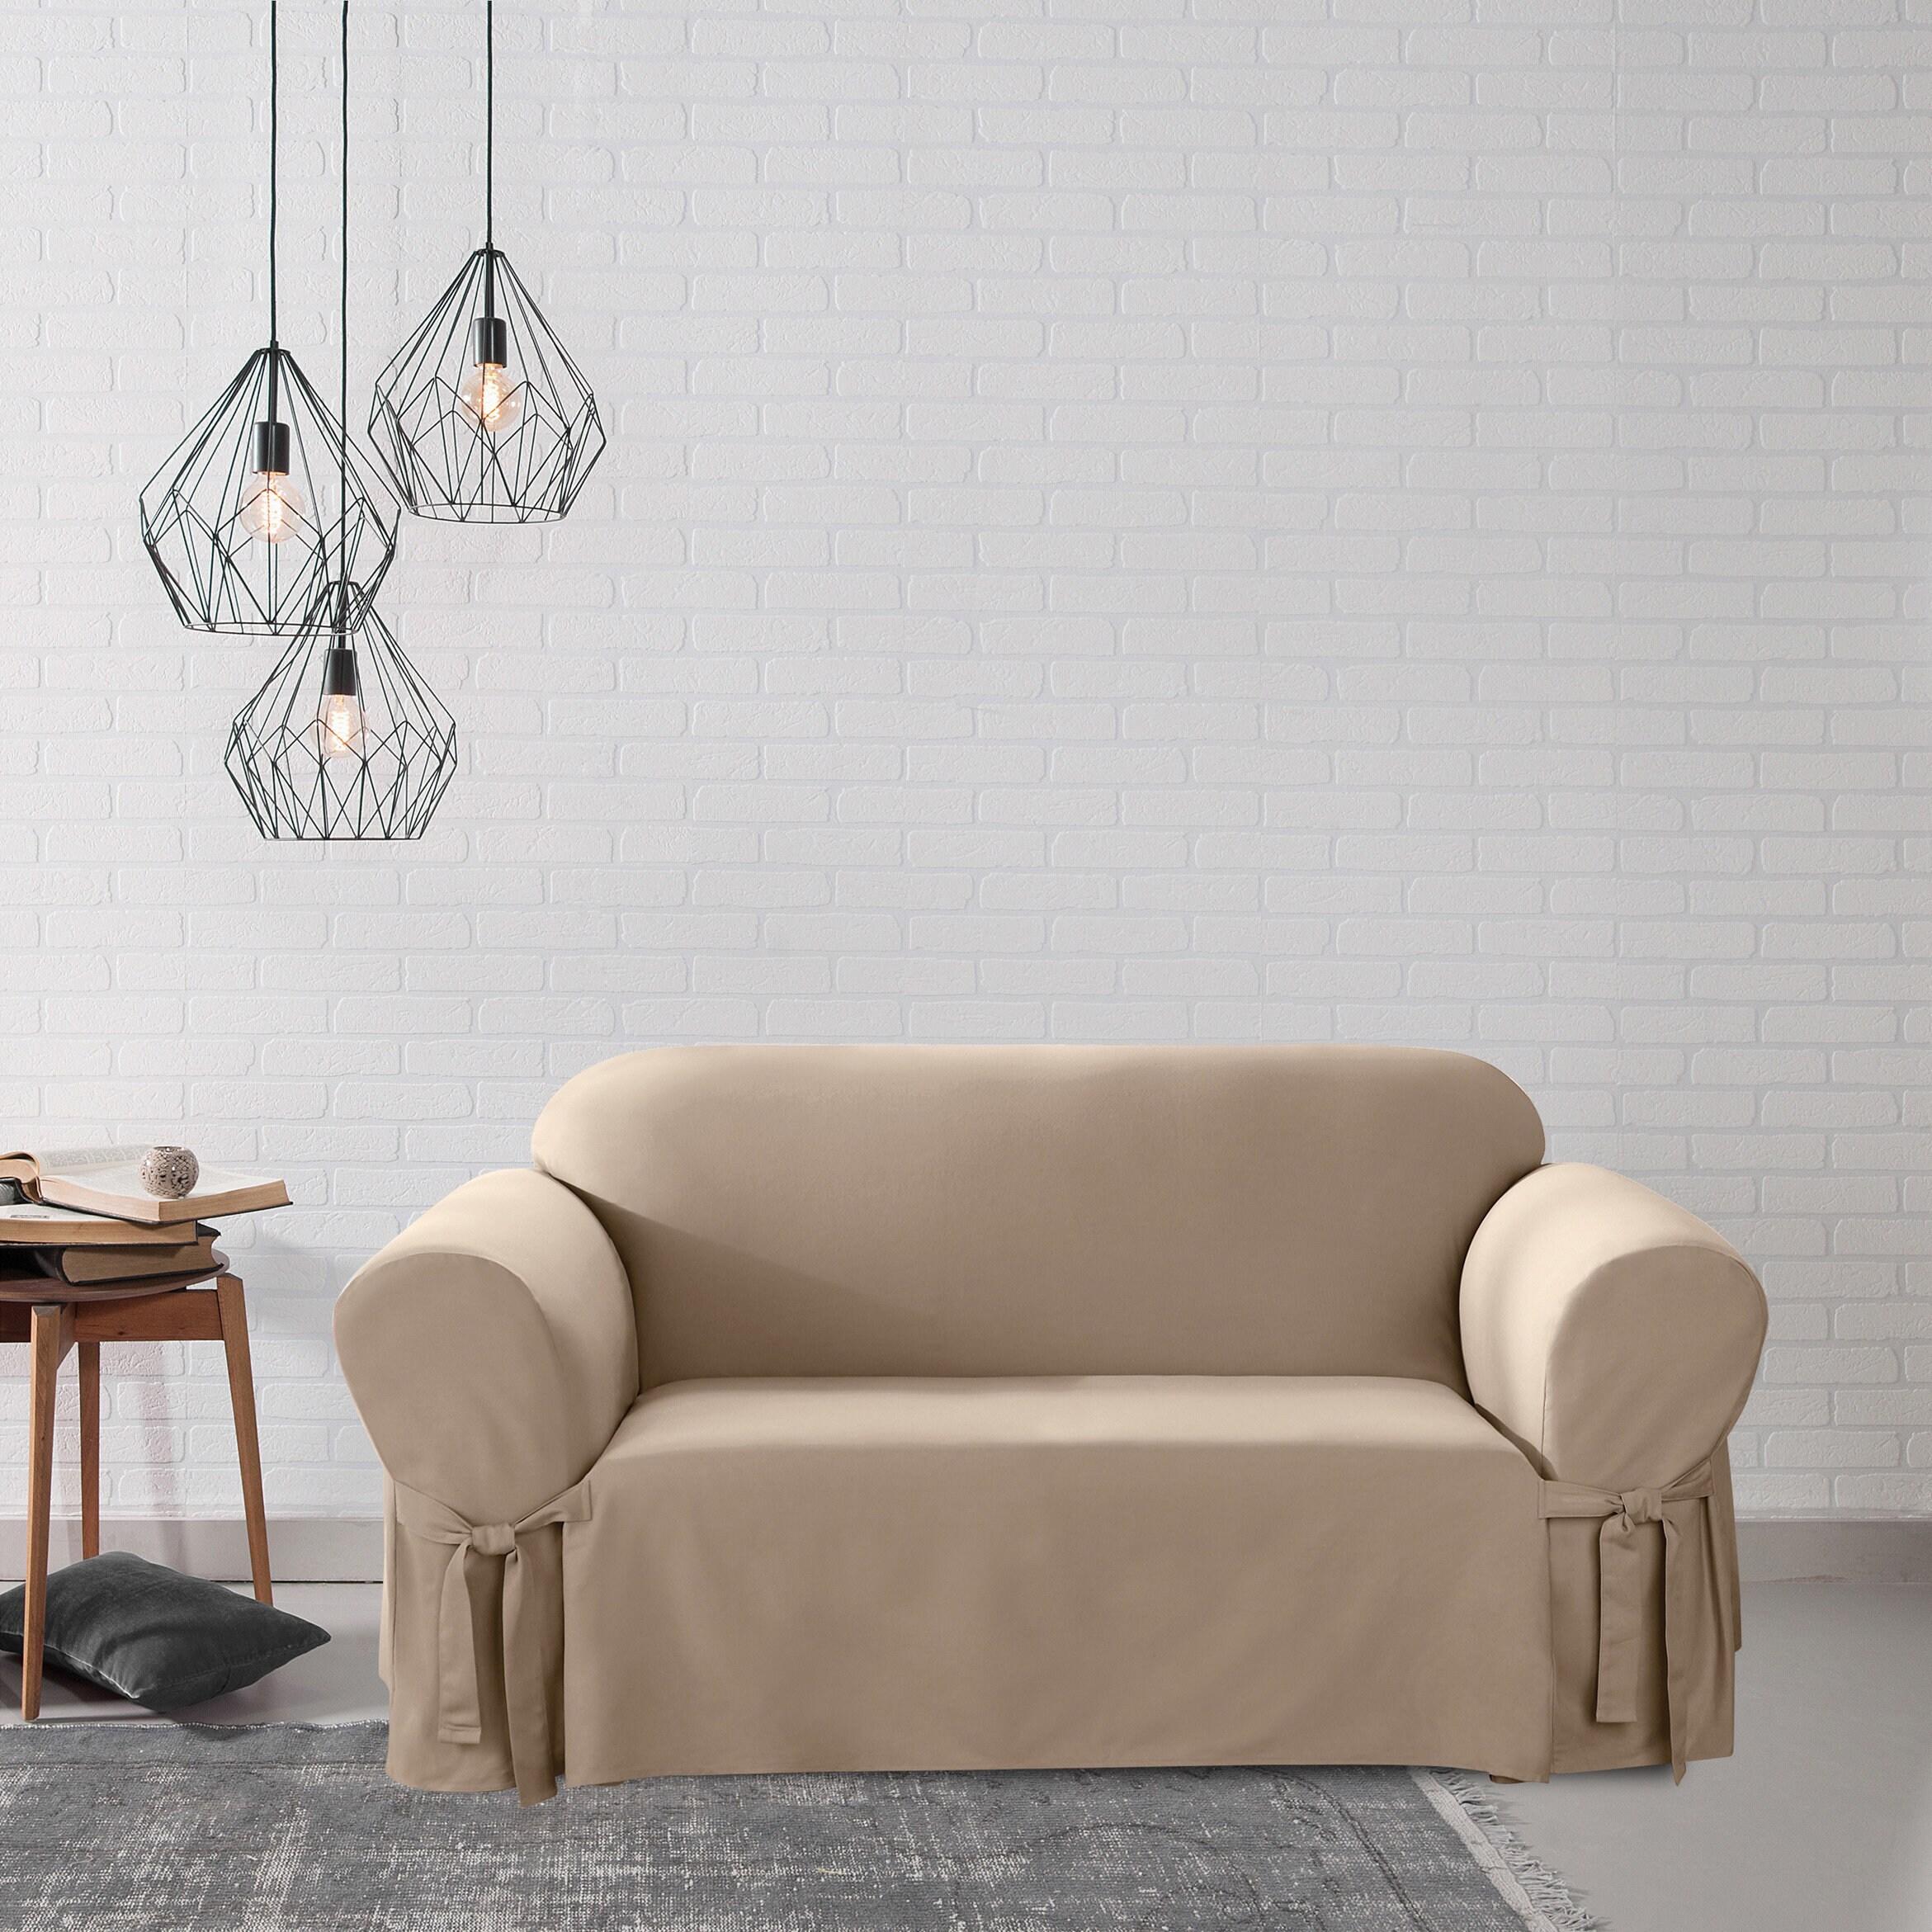 Cool Sure Fit Cotton Duck Washable Loveseat Slipcover Short Links Chair Design For Home Short Linksinfo